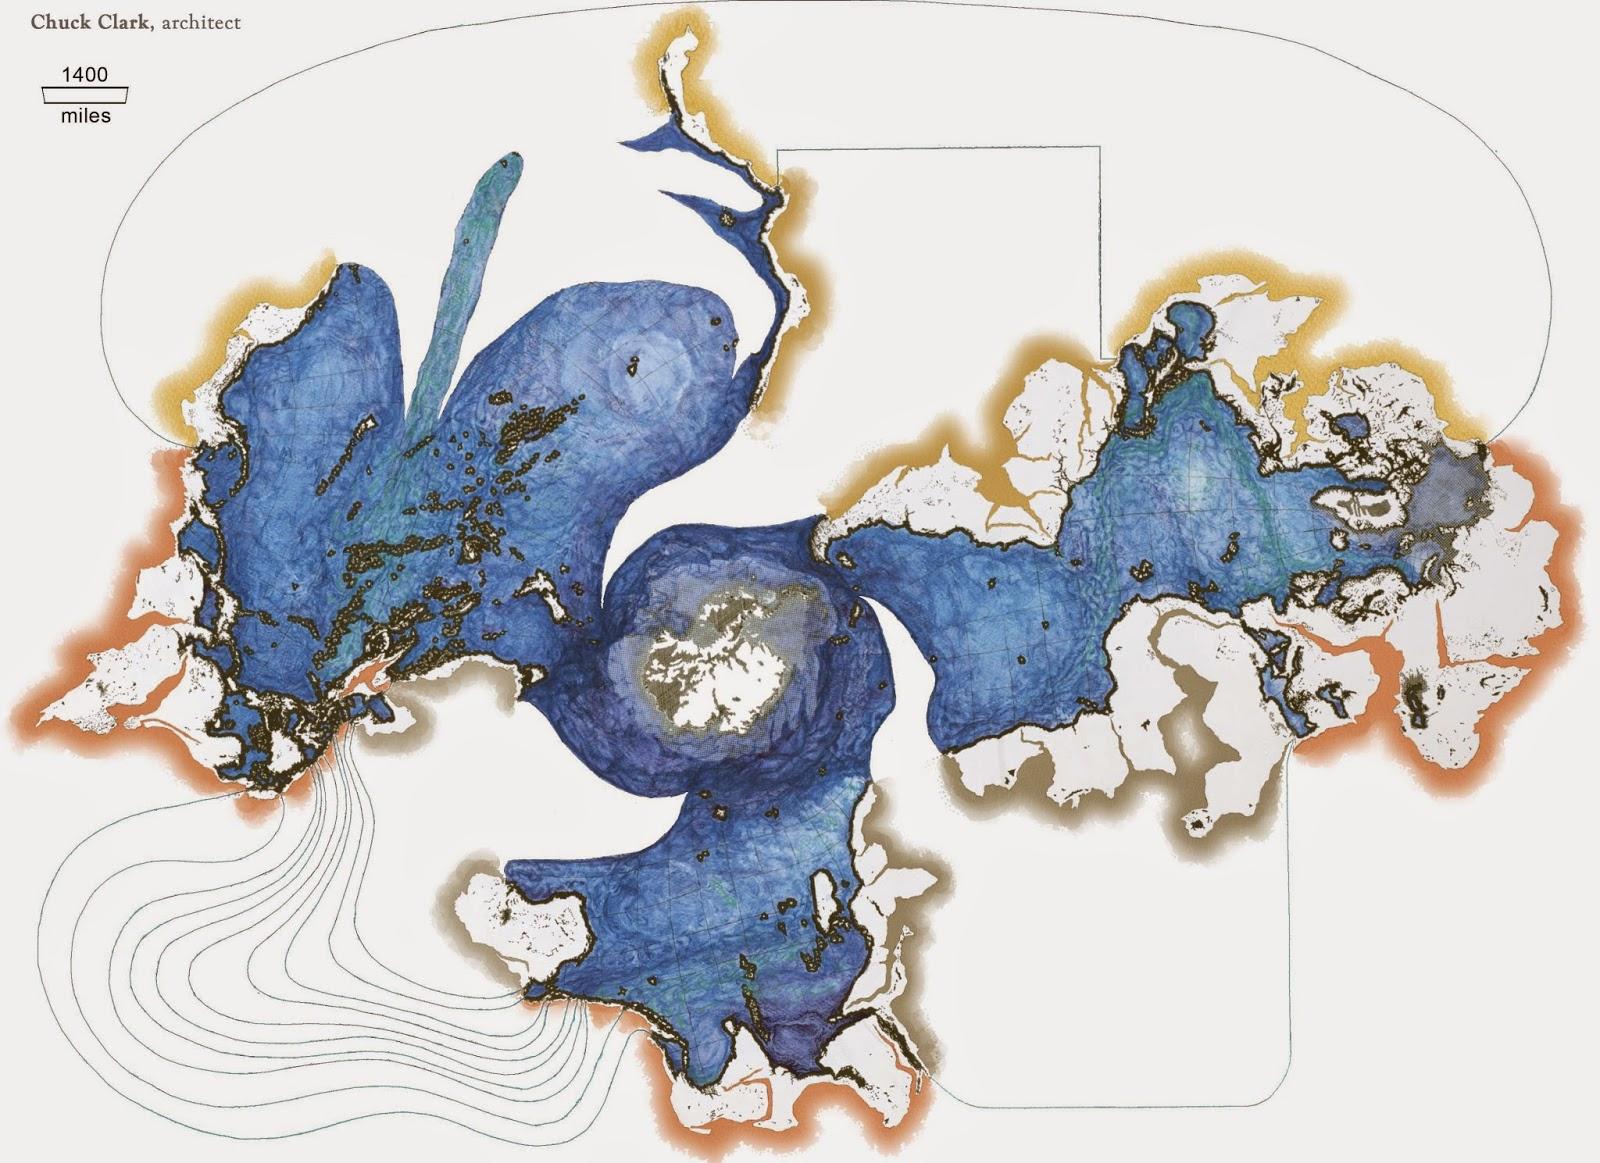 Ocean Mondial Chuck Clark architect